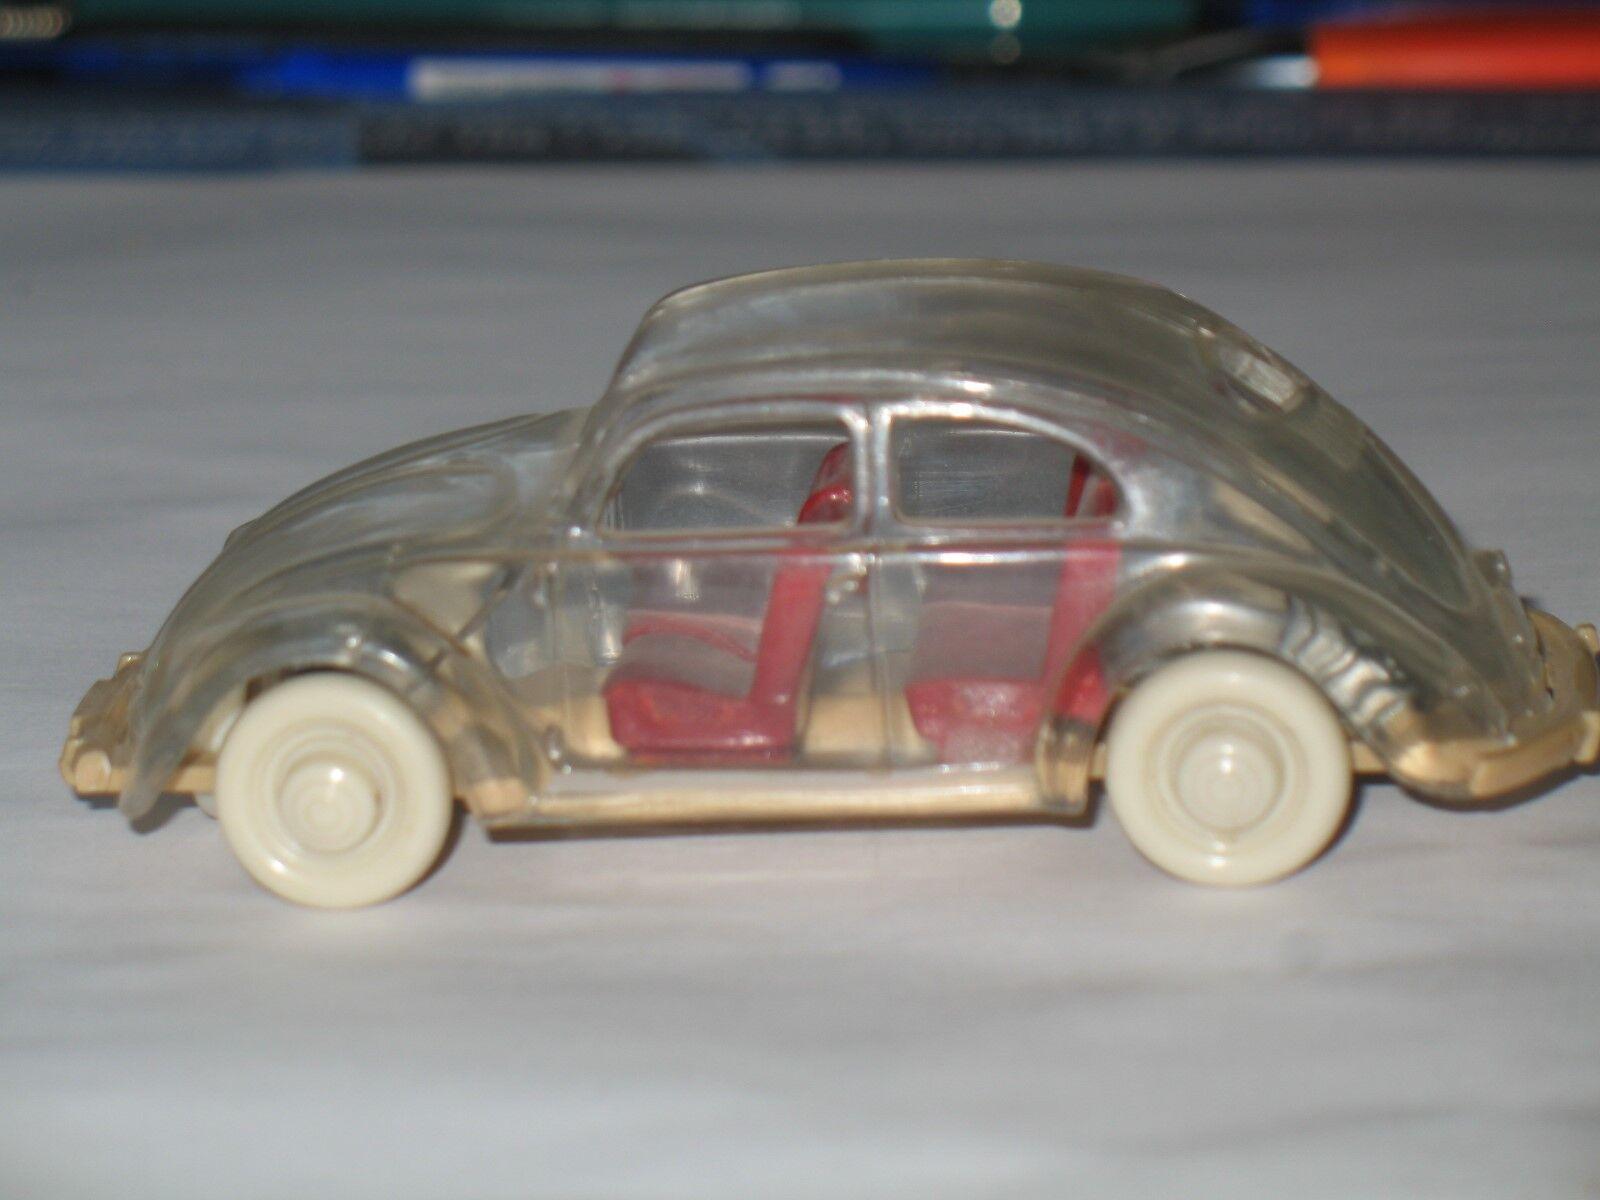 VW Brezelkäfer 1950 51 Original Werbemodell VW ca.1 43  | Verkauf Online-Shop